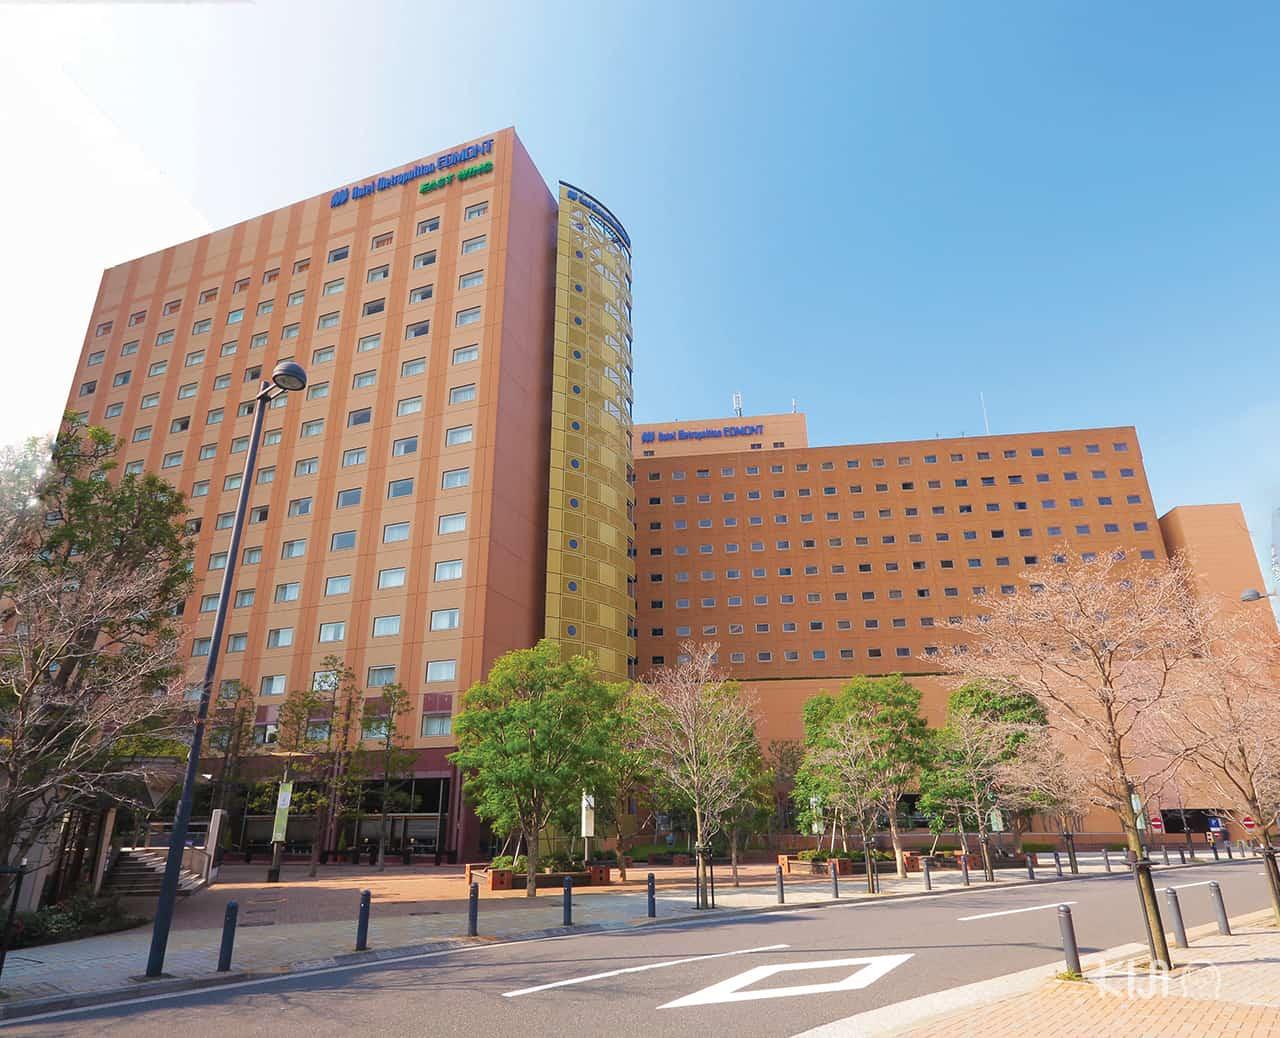 Hotel Metropolitan EdmontTokyo